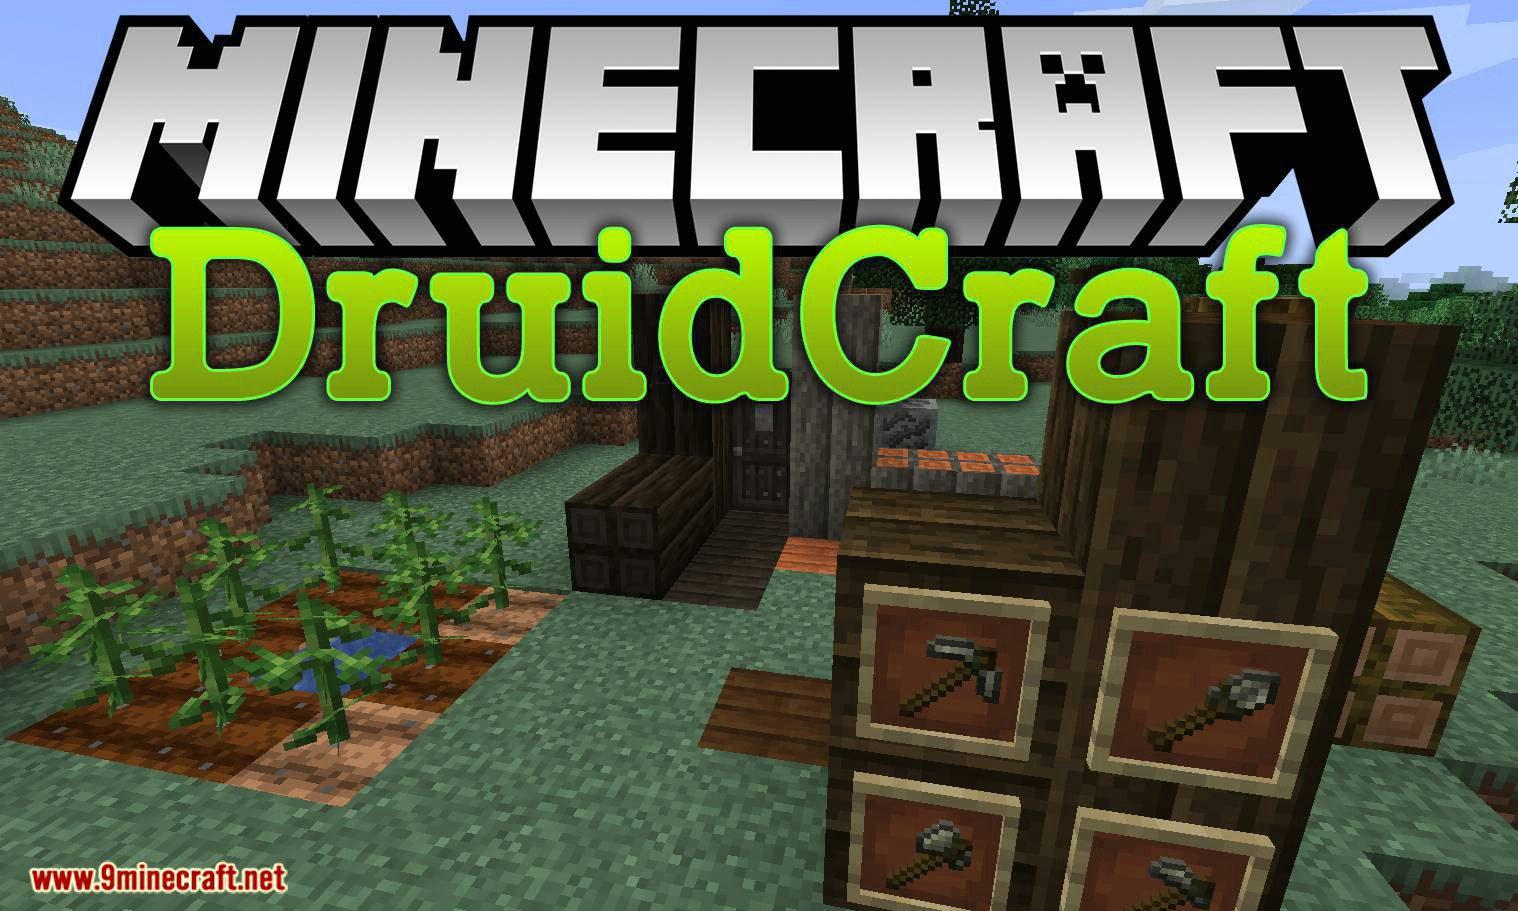 Druidcraft mod for minecraft logo